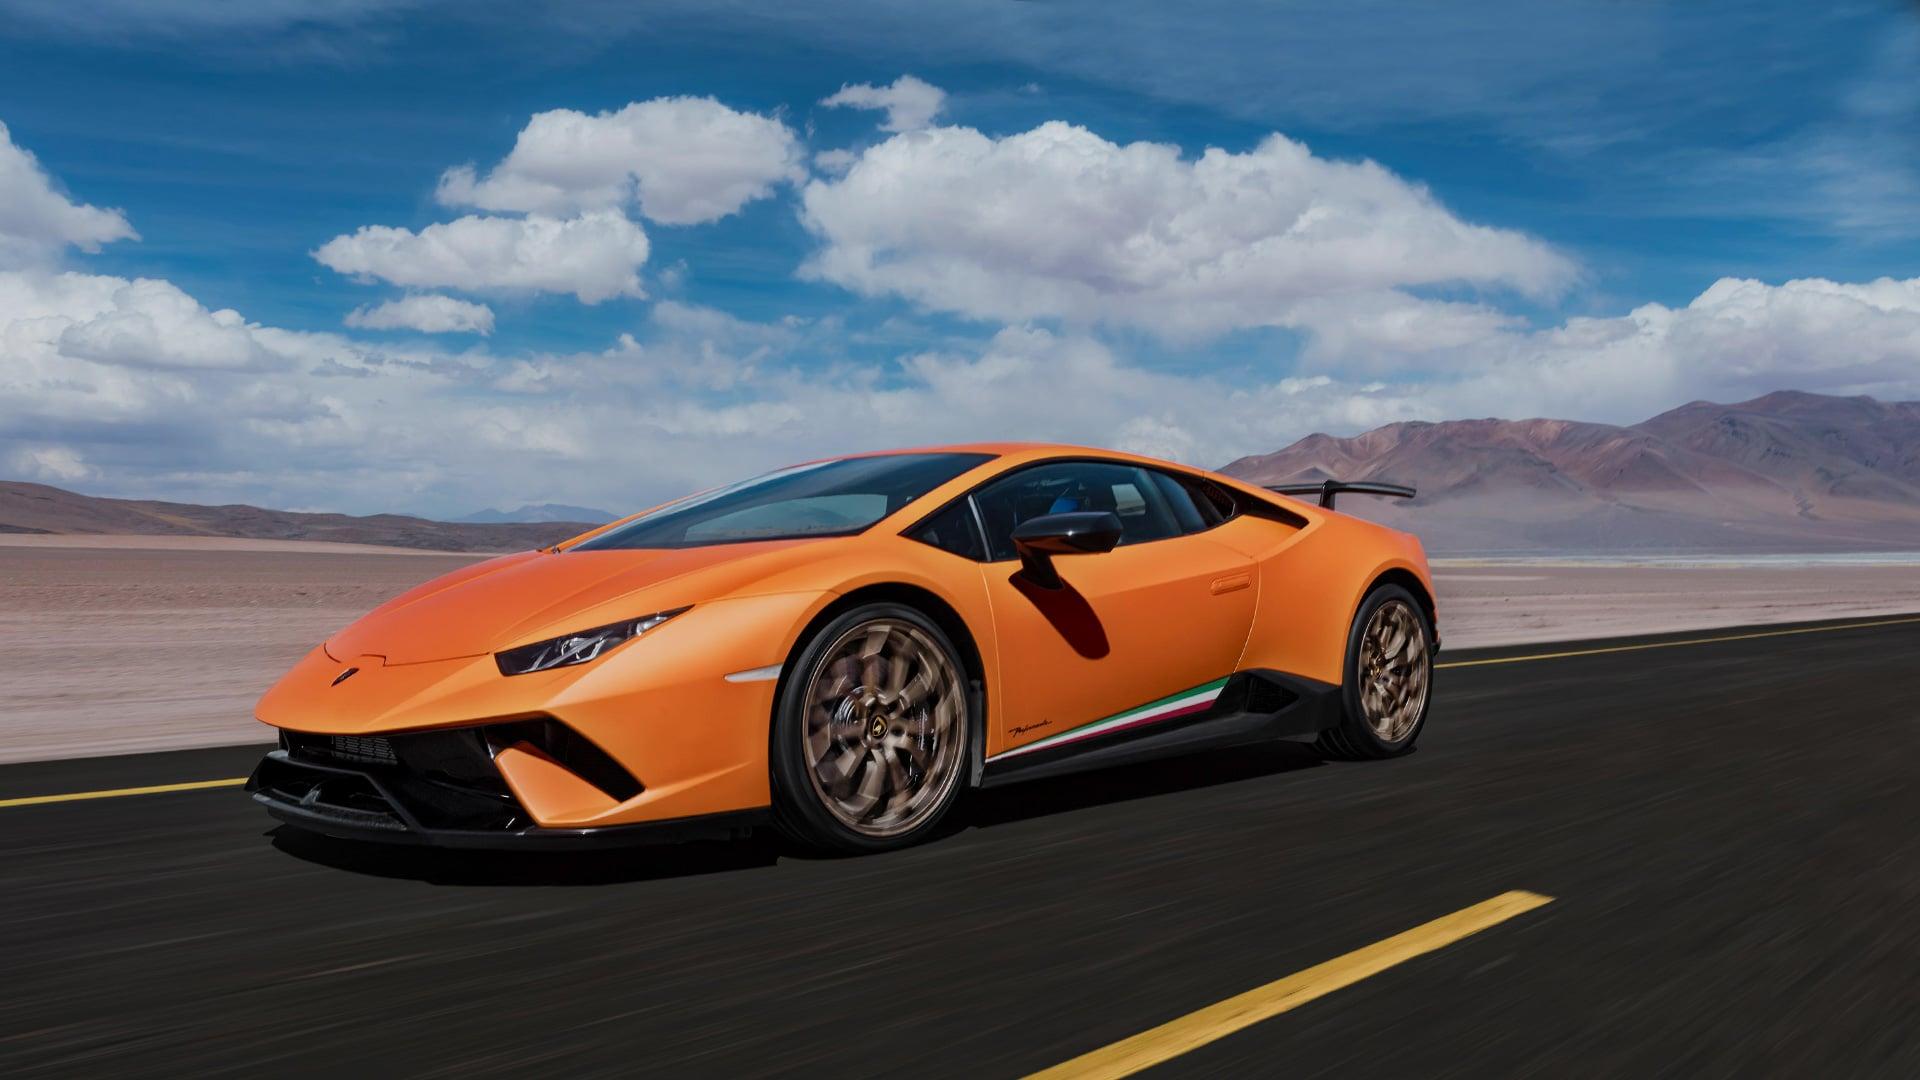 En Lamborghini Huracán, foto: Lamborghini.com